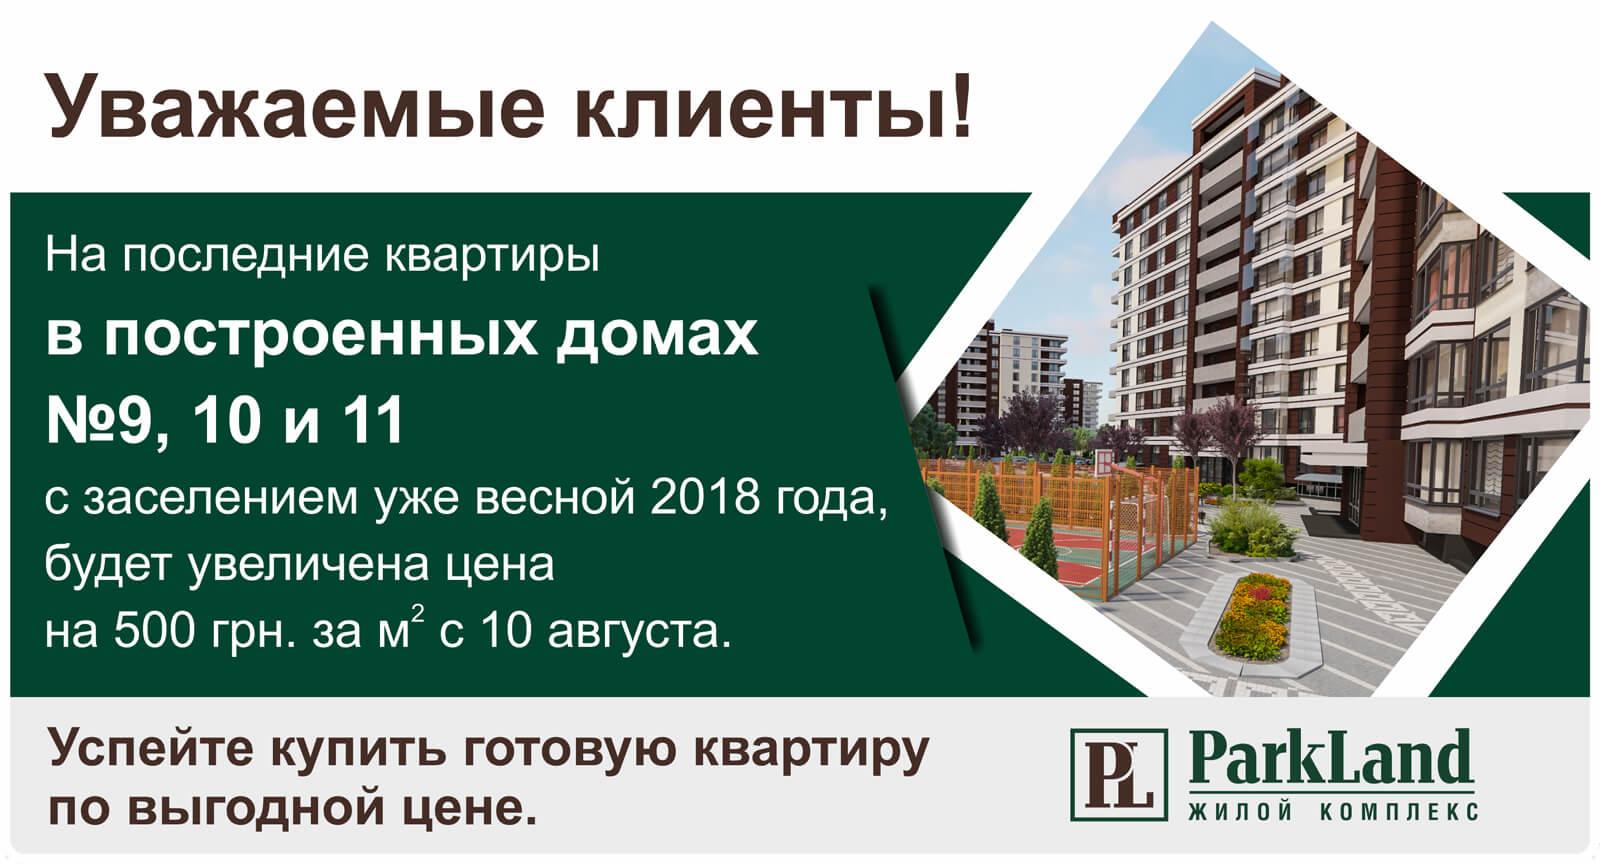 news280717-ru